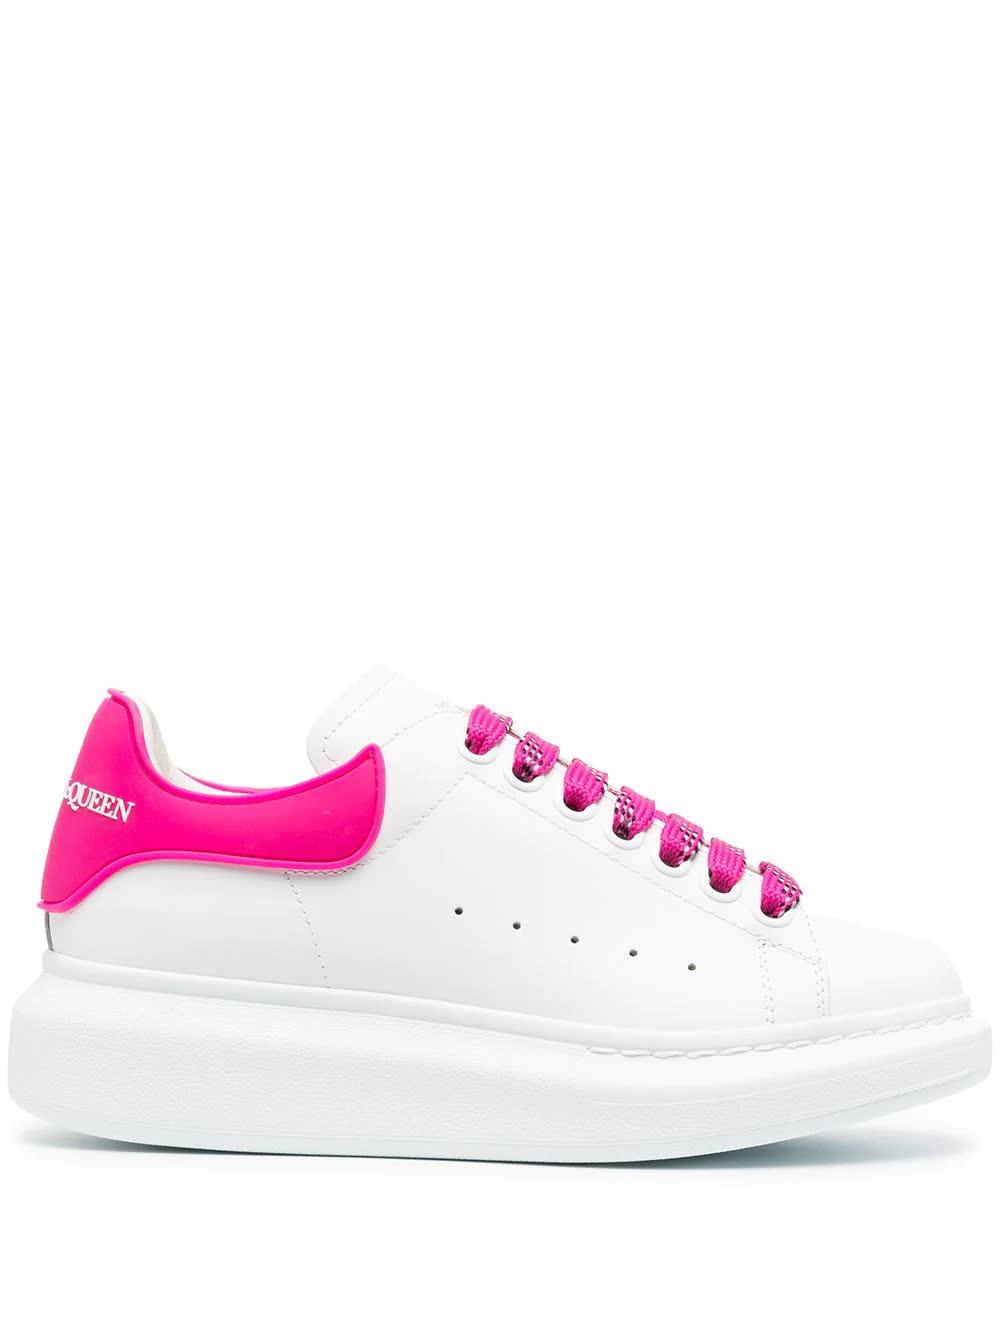 Alexander McQueen Woman White Oversize Sneakers With Fuchsia Rubber Spoiler